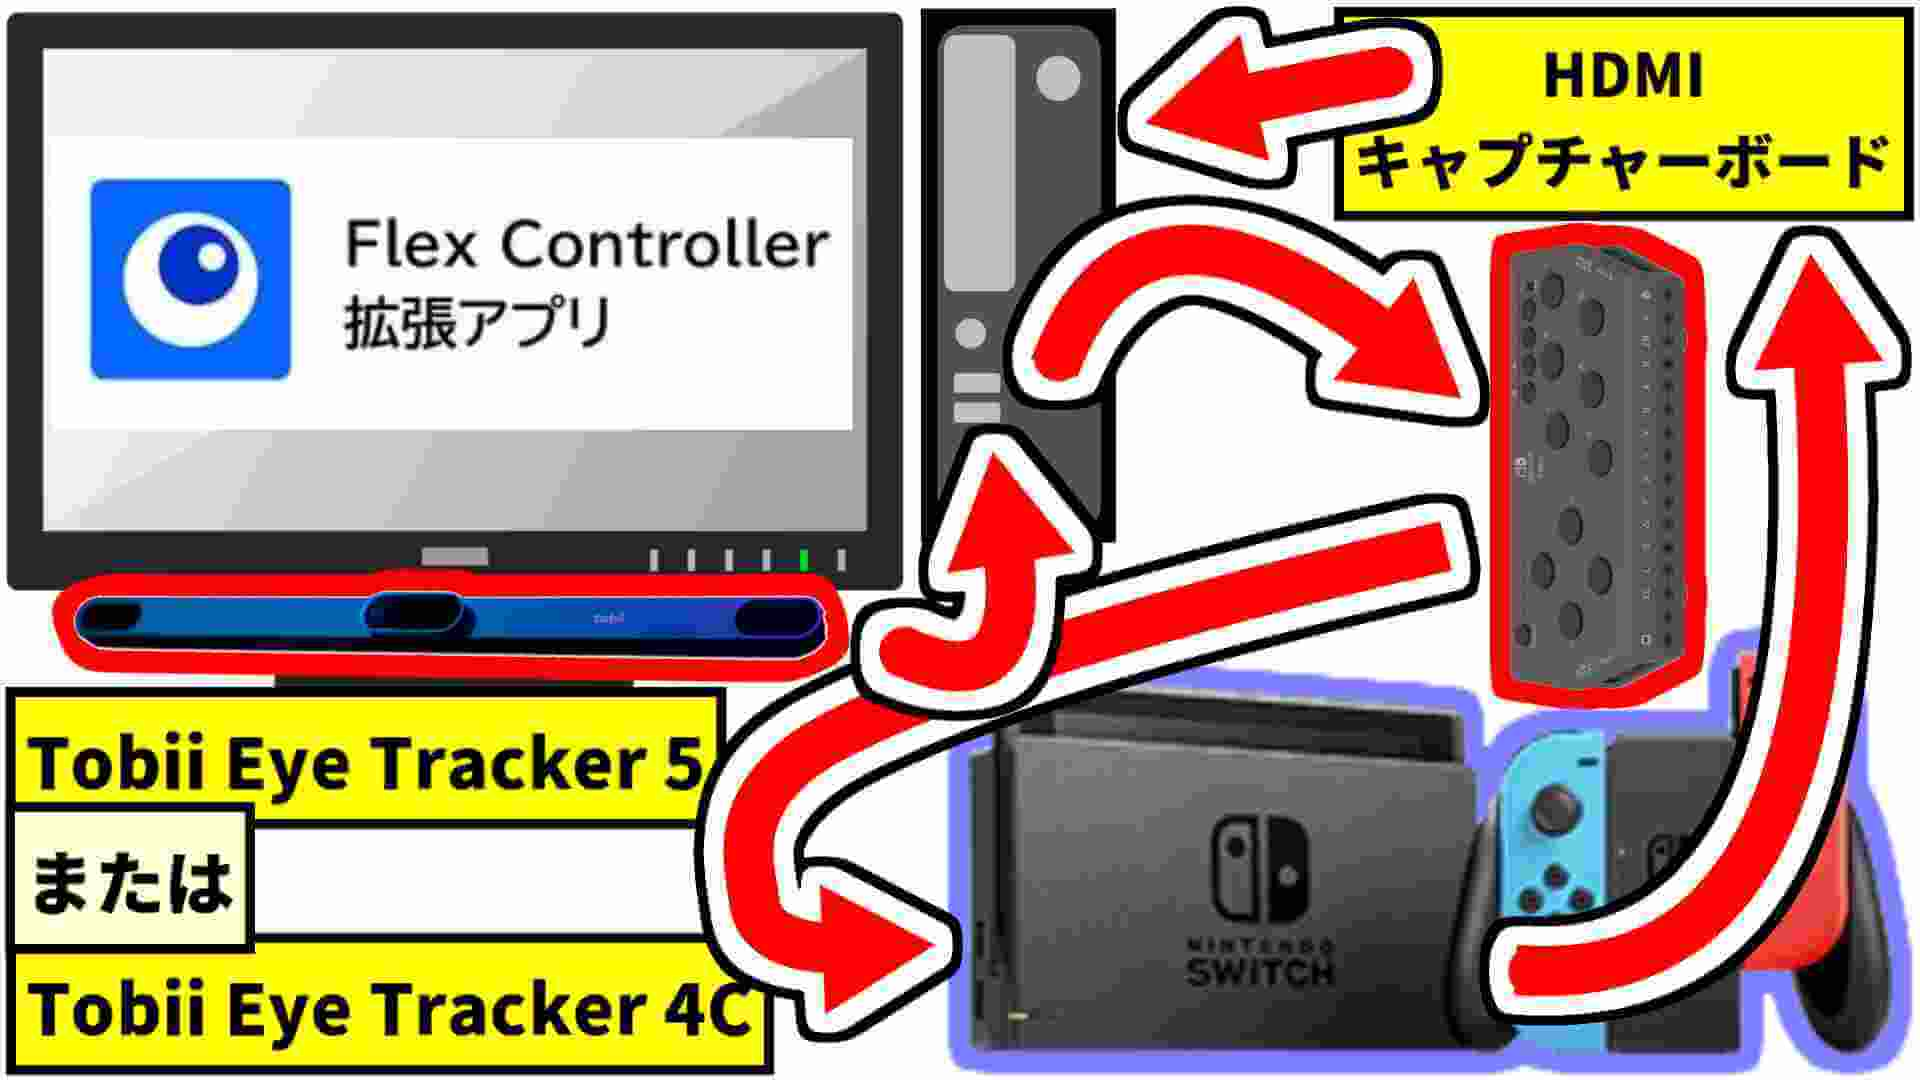 Flex Controllerの視線入力用の拡張アプリの接続図